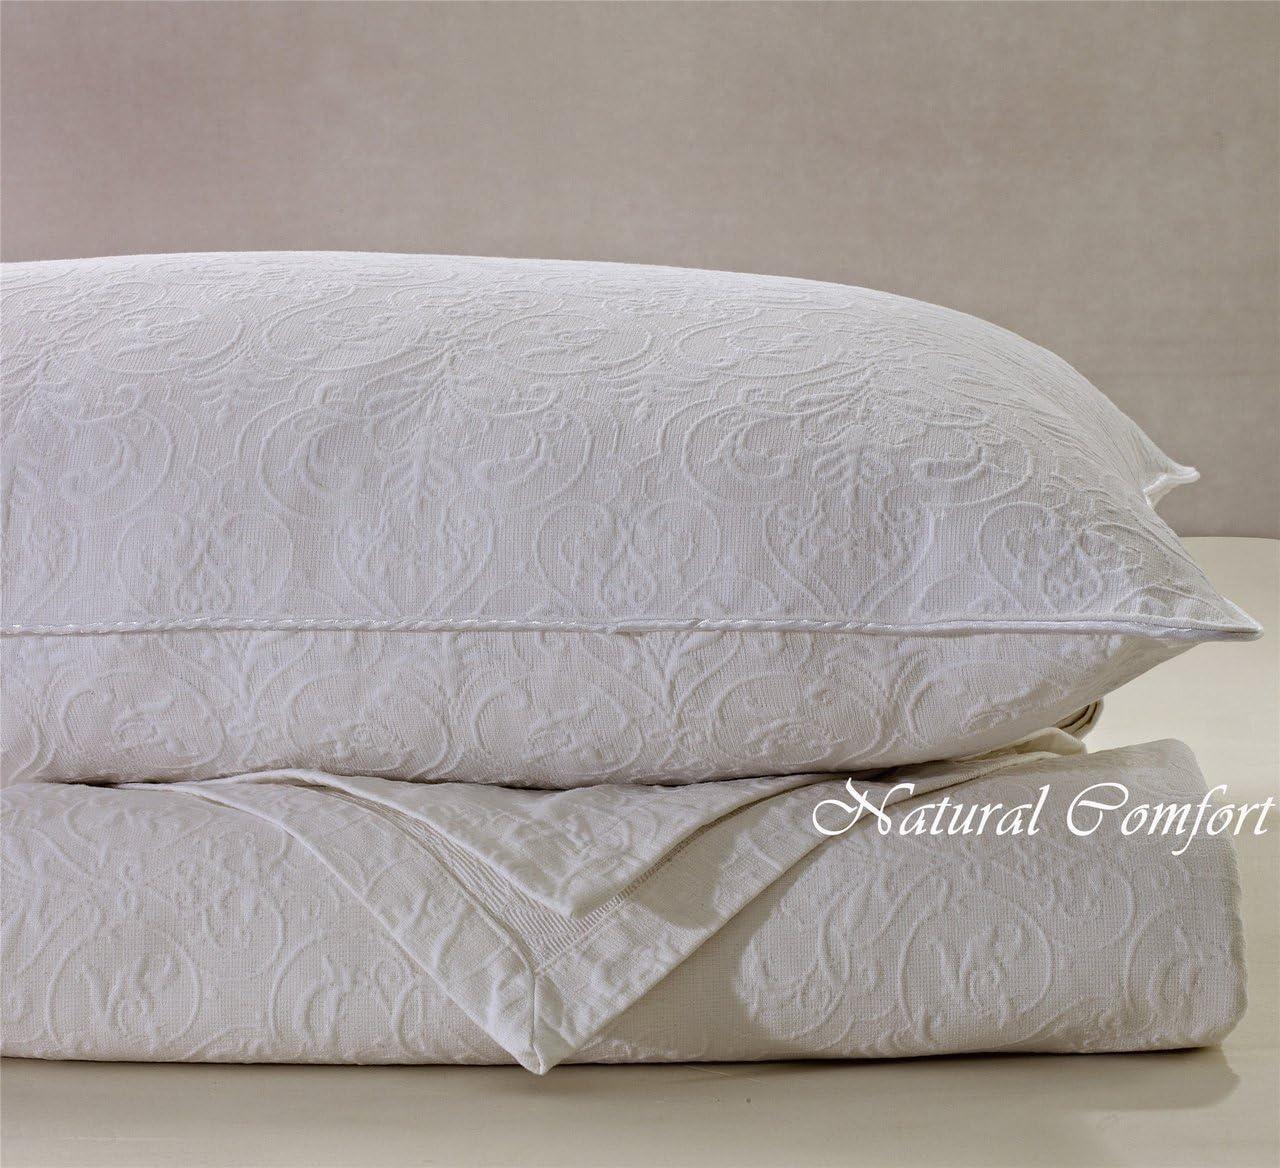 Queen Foliage//Water Blue Natural Comfort Matelass/é Blanket Coverlet